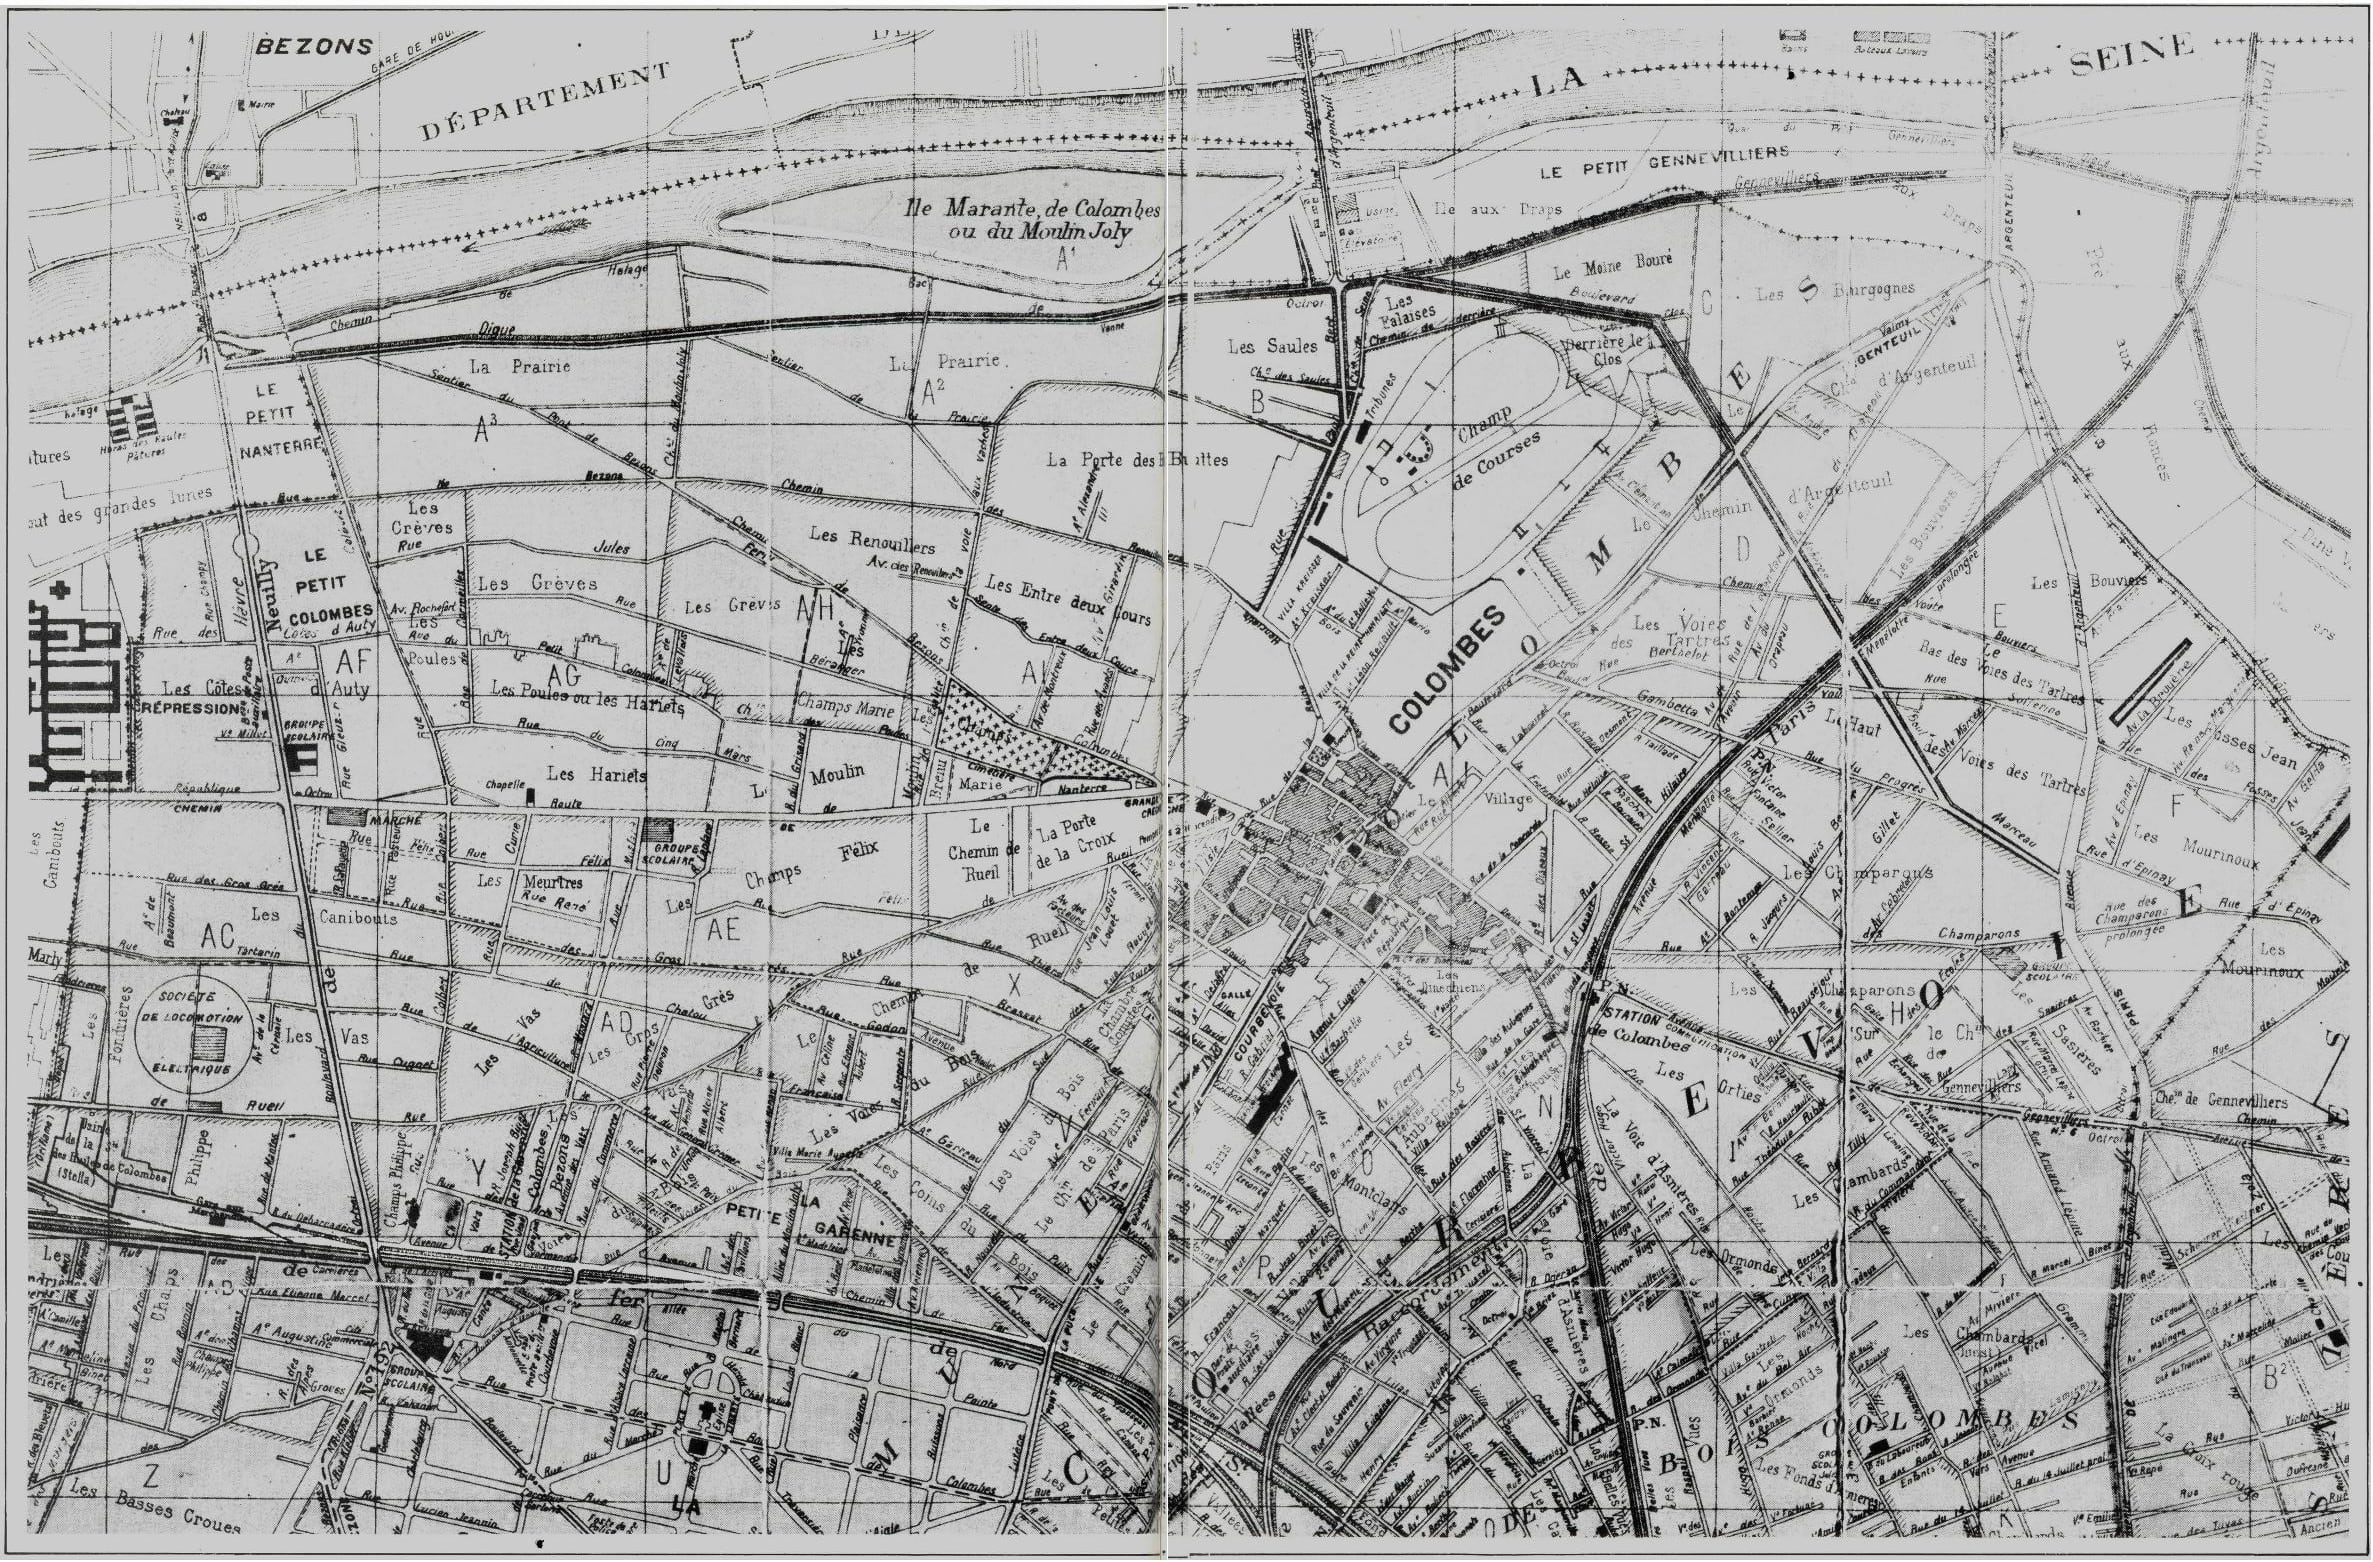 Plan de la ville de Colombes en 1900.